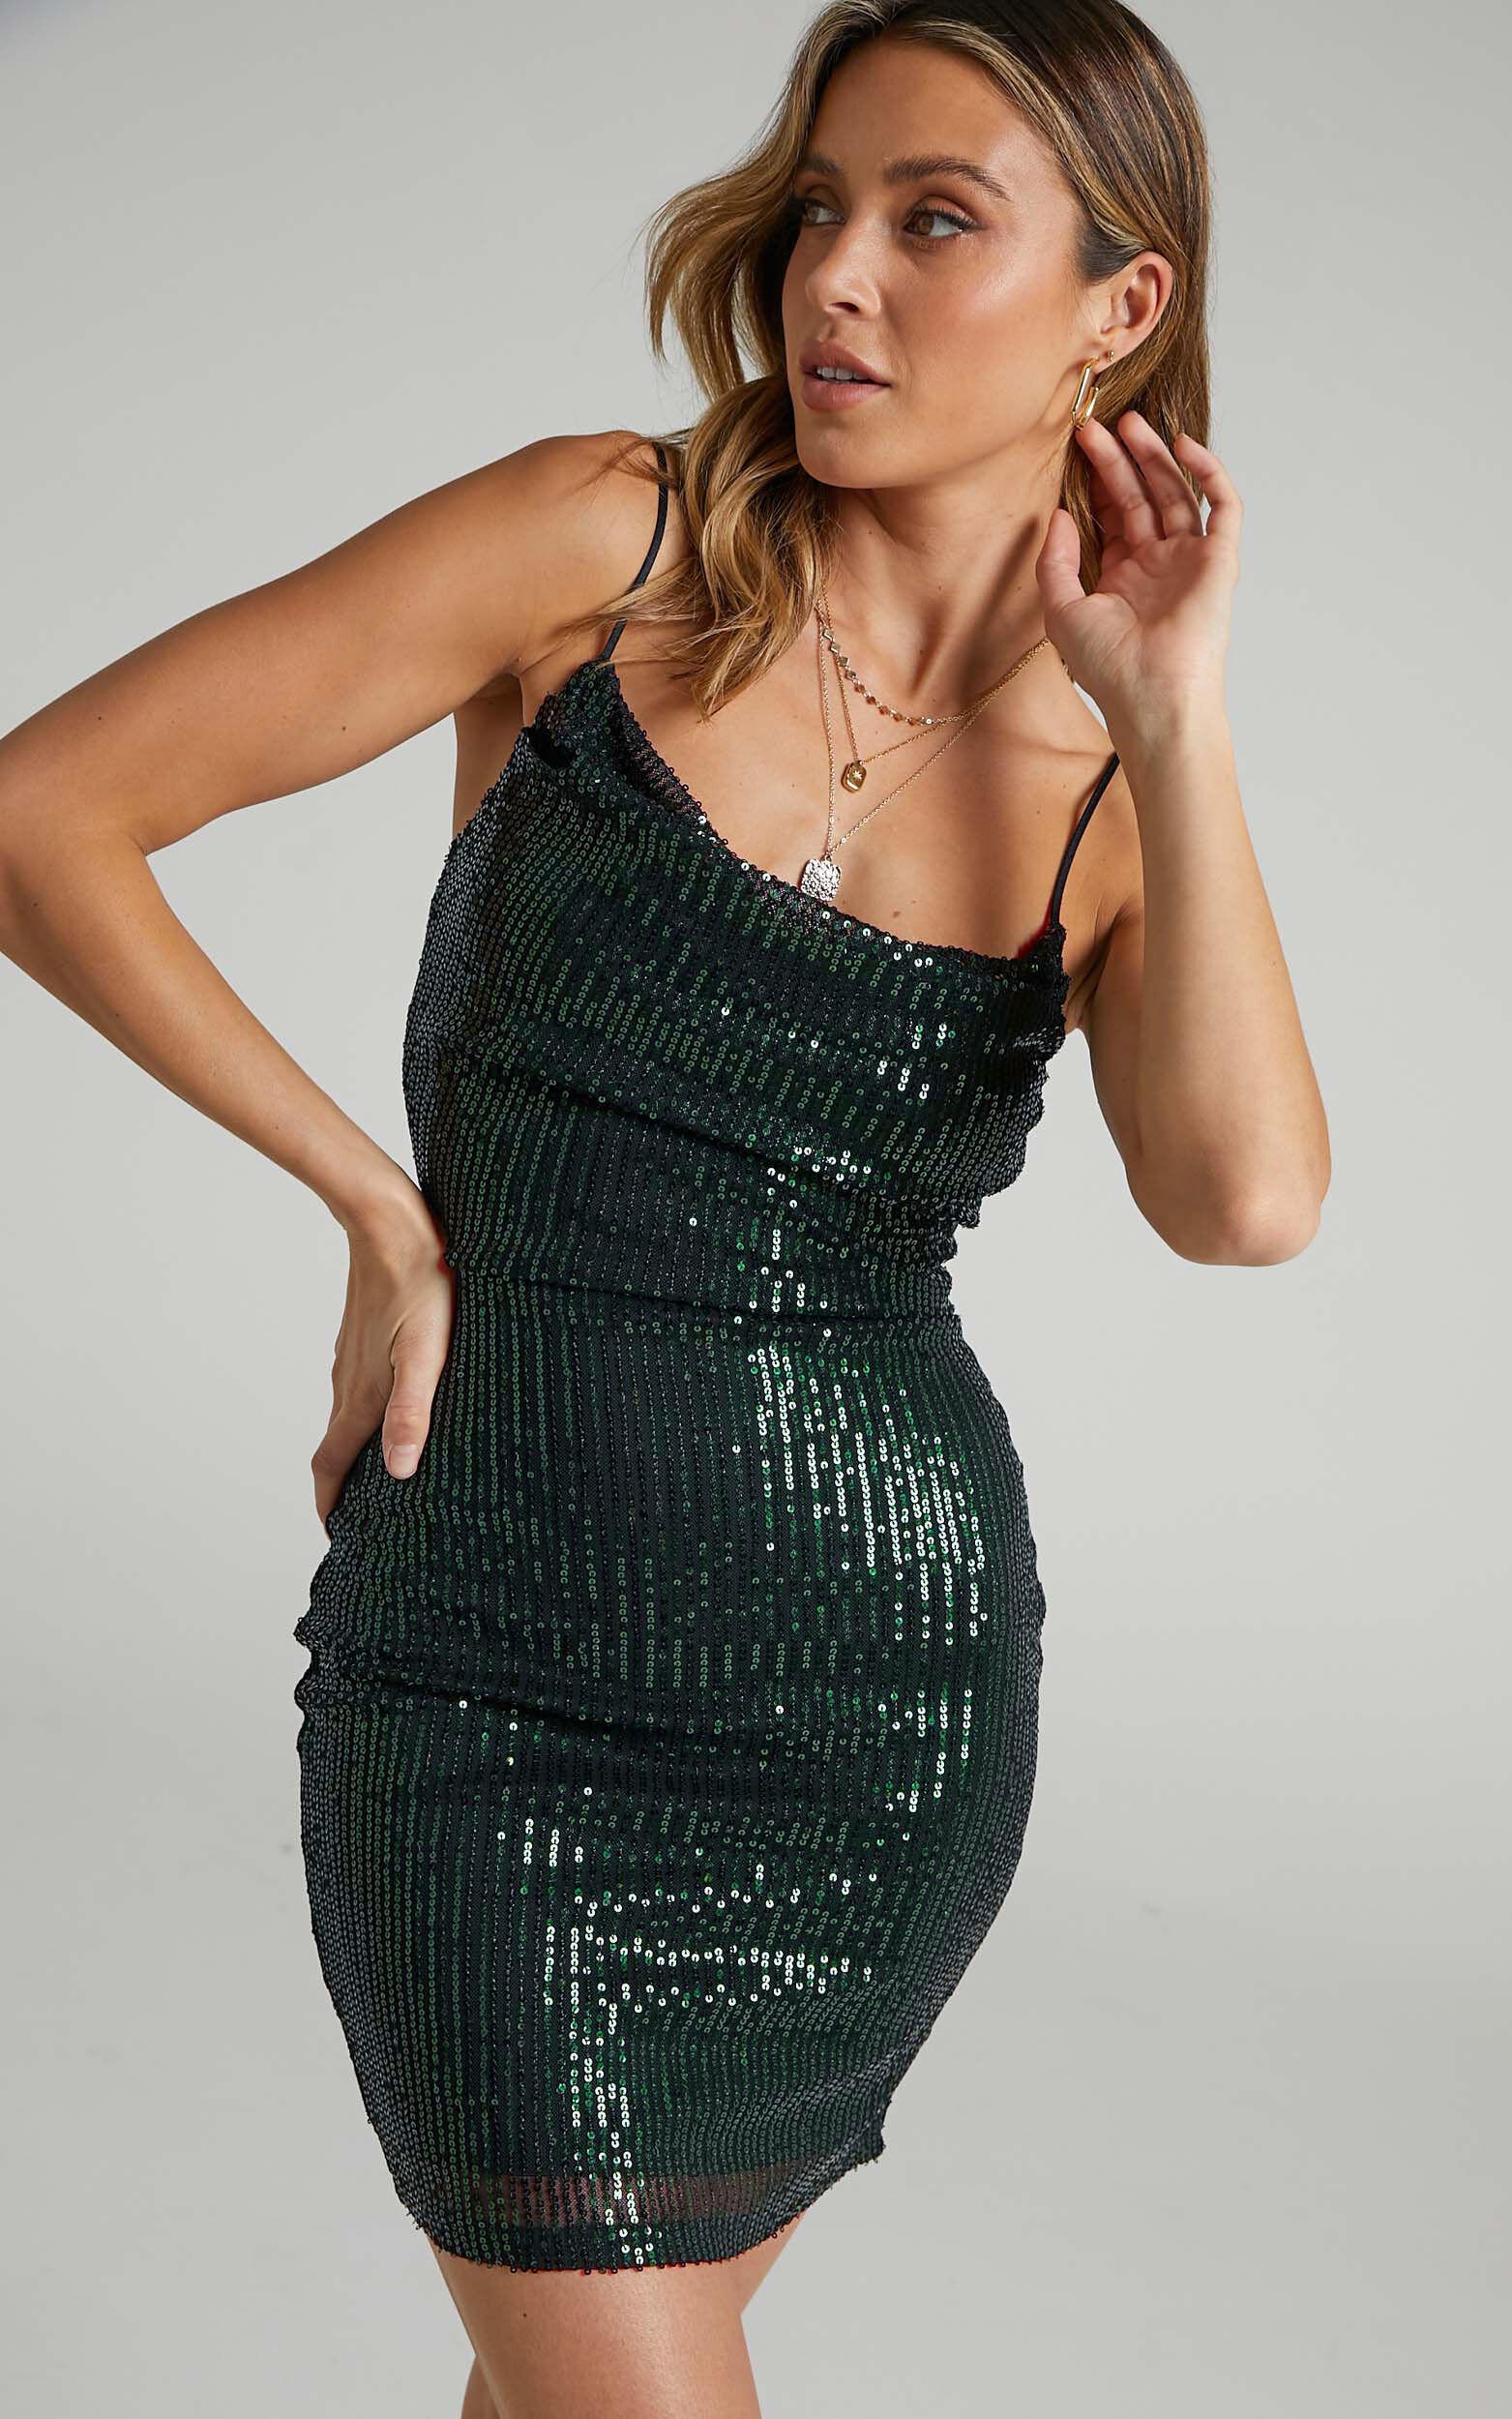 Talyah Mini Dress in Emerald Sequin - 06, GRN1, super-hi-res image number null